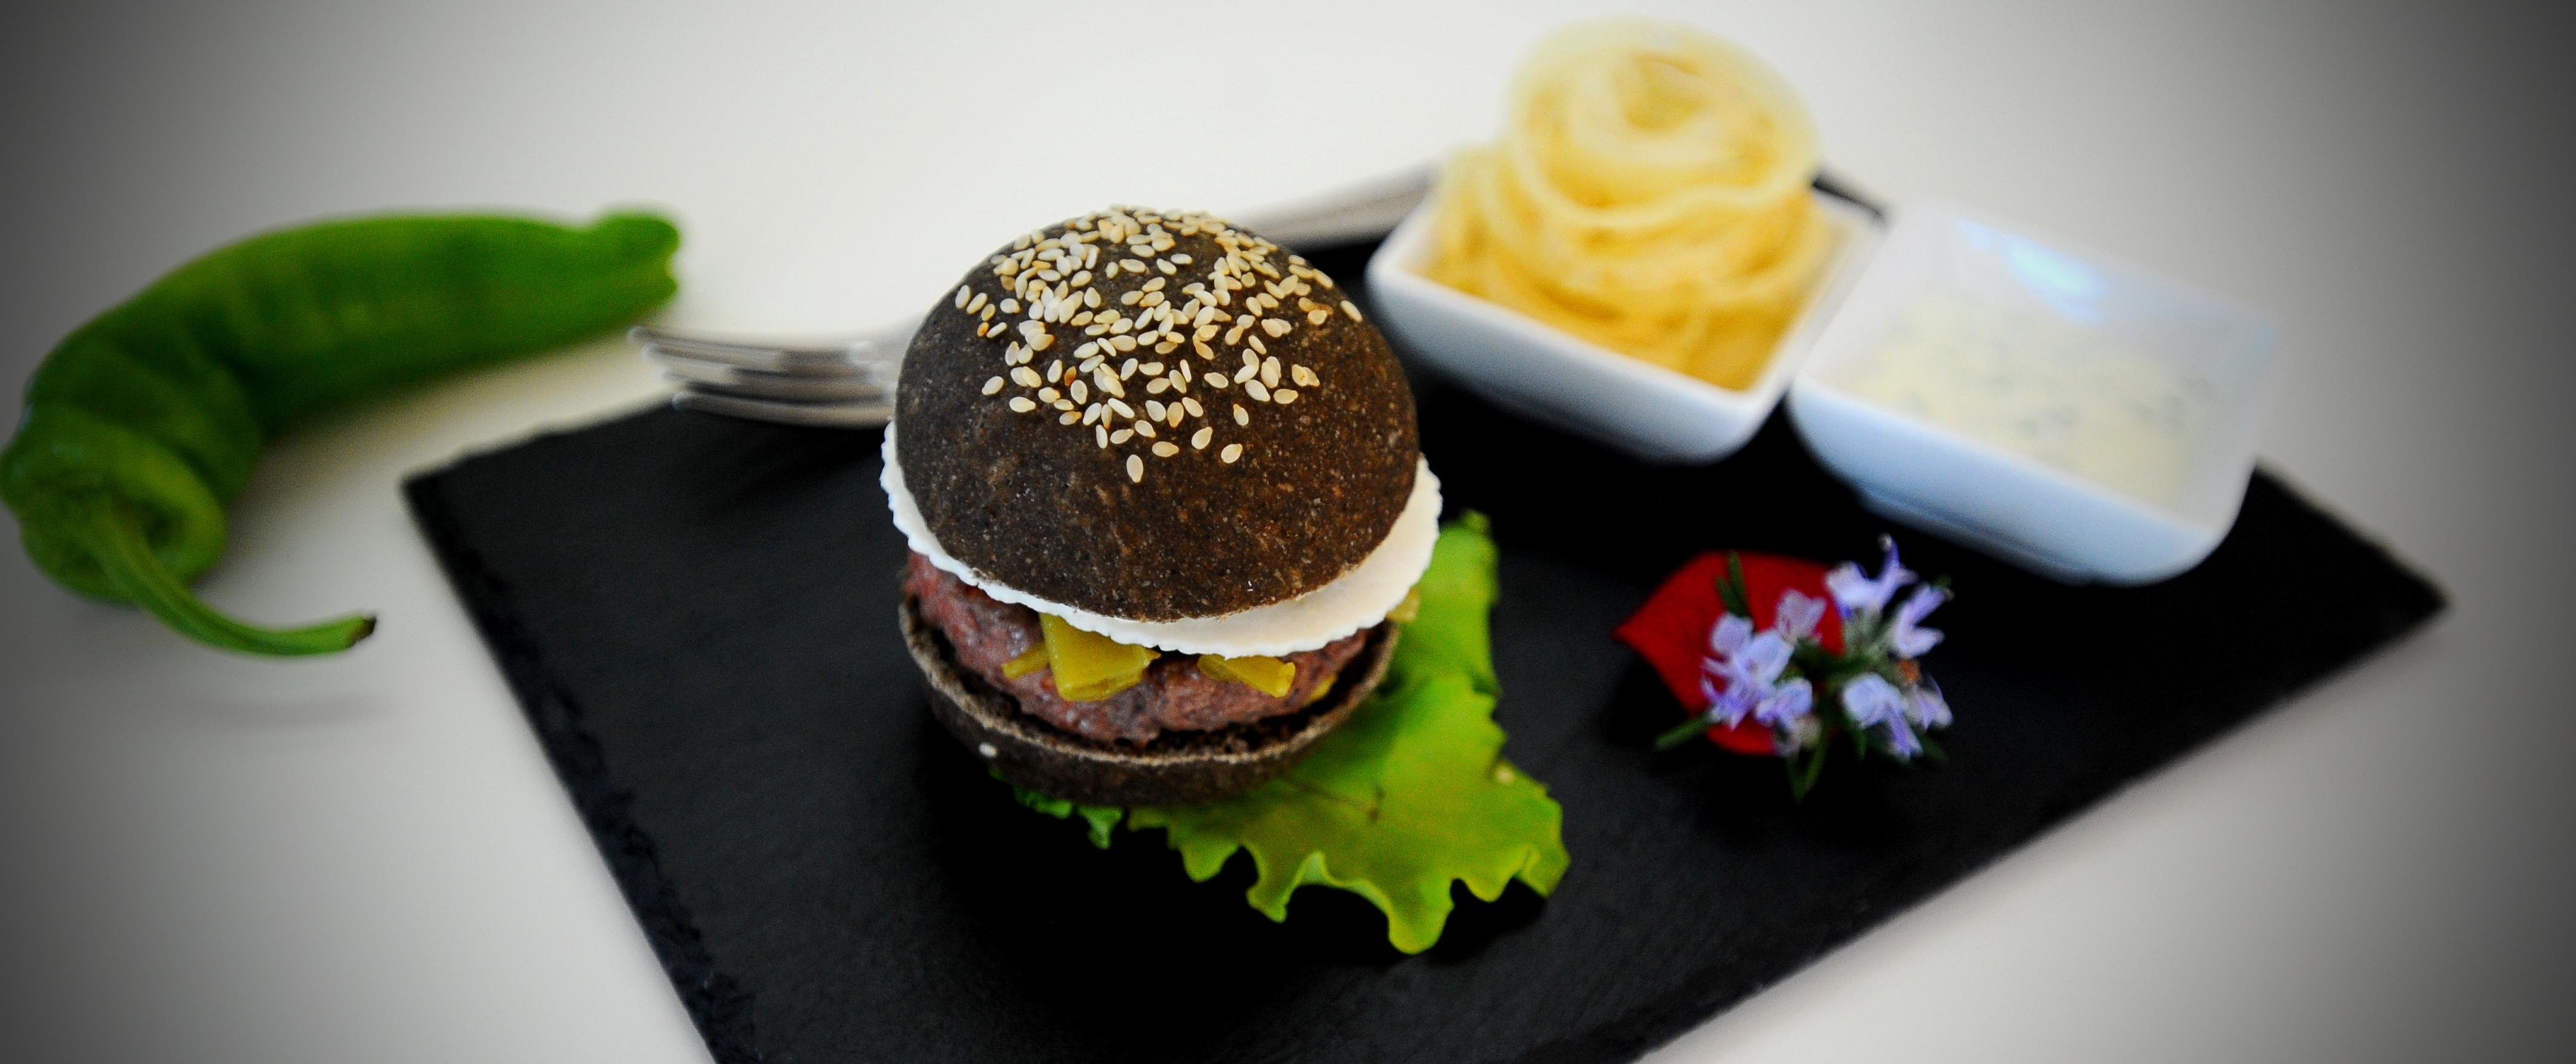 Mini burger al grano arso ricetta fingerfood di mangiare - Cucina gourmet ricette ...